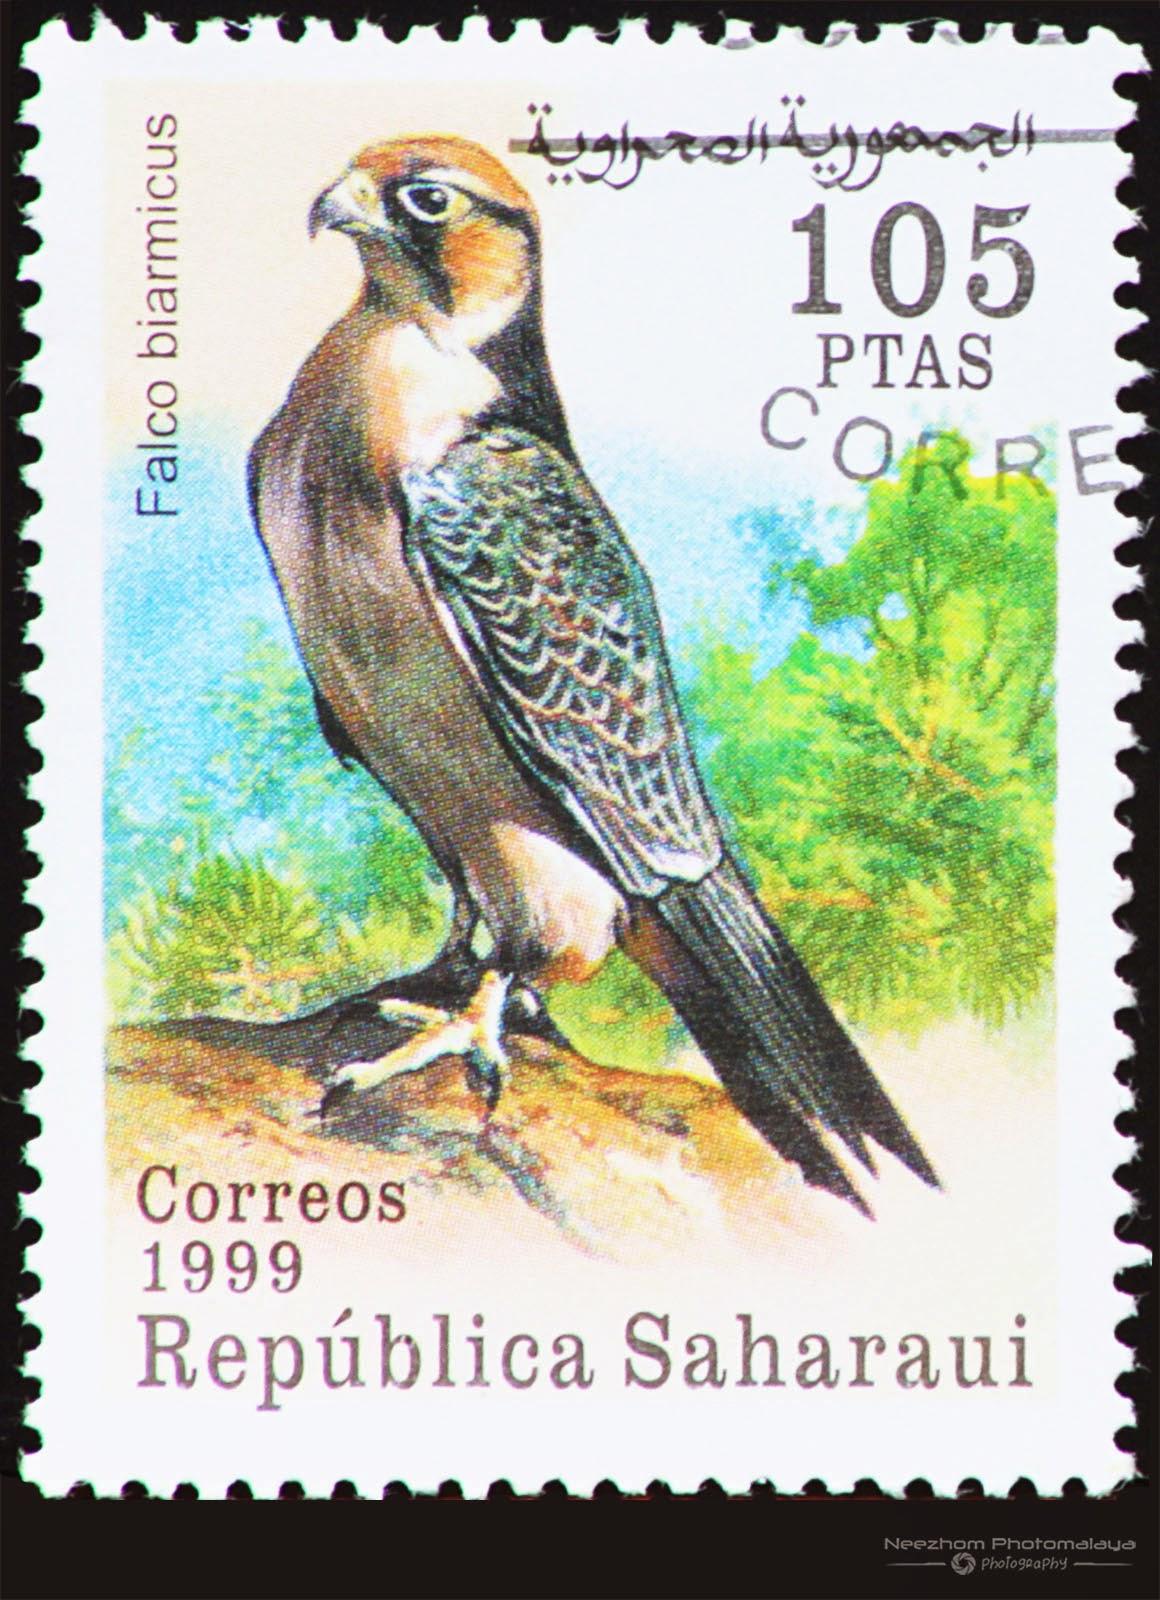 Western Sahara 1999 Birds of Prey stamp - Lanner Falcon (Falco biarmicus) 105 ptas